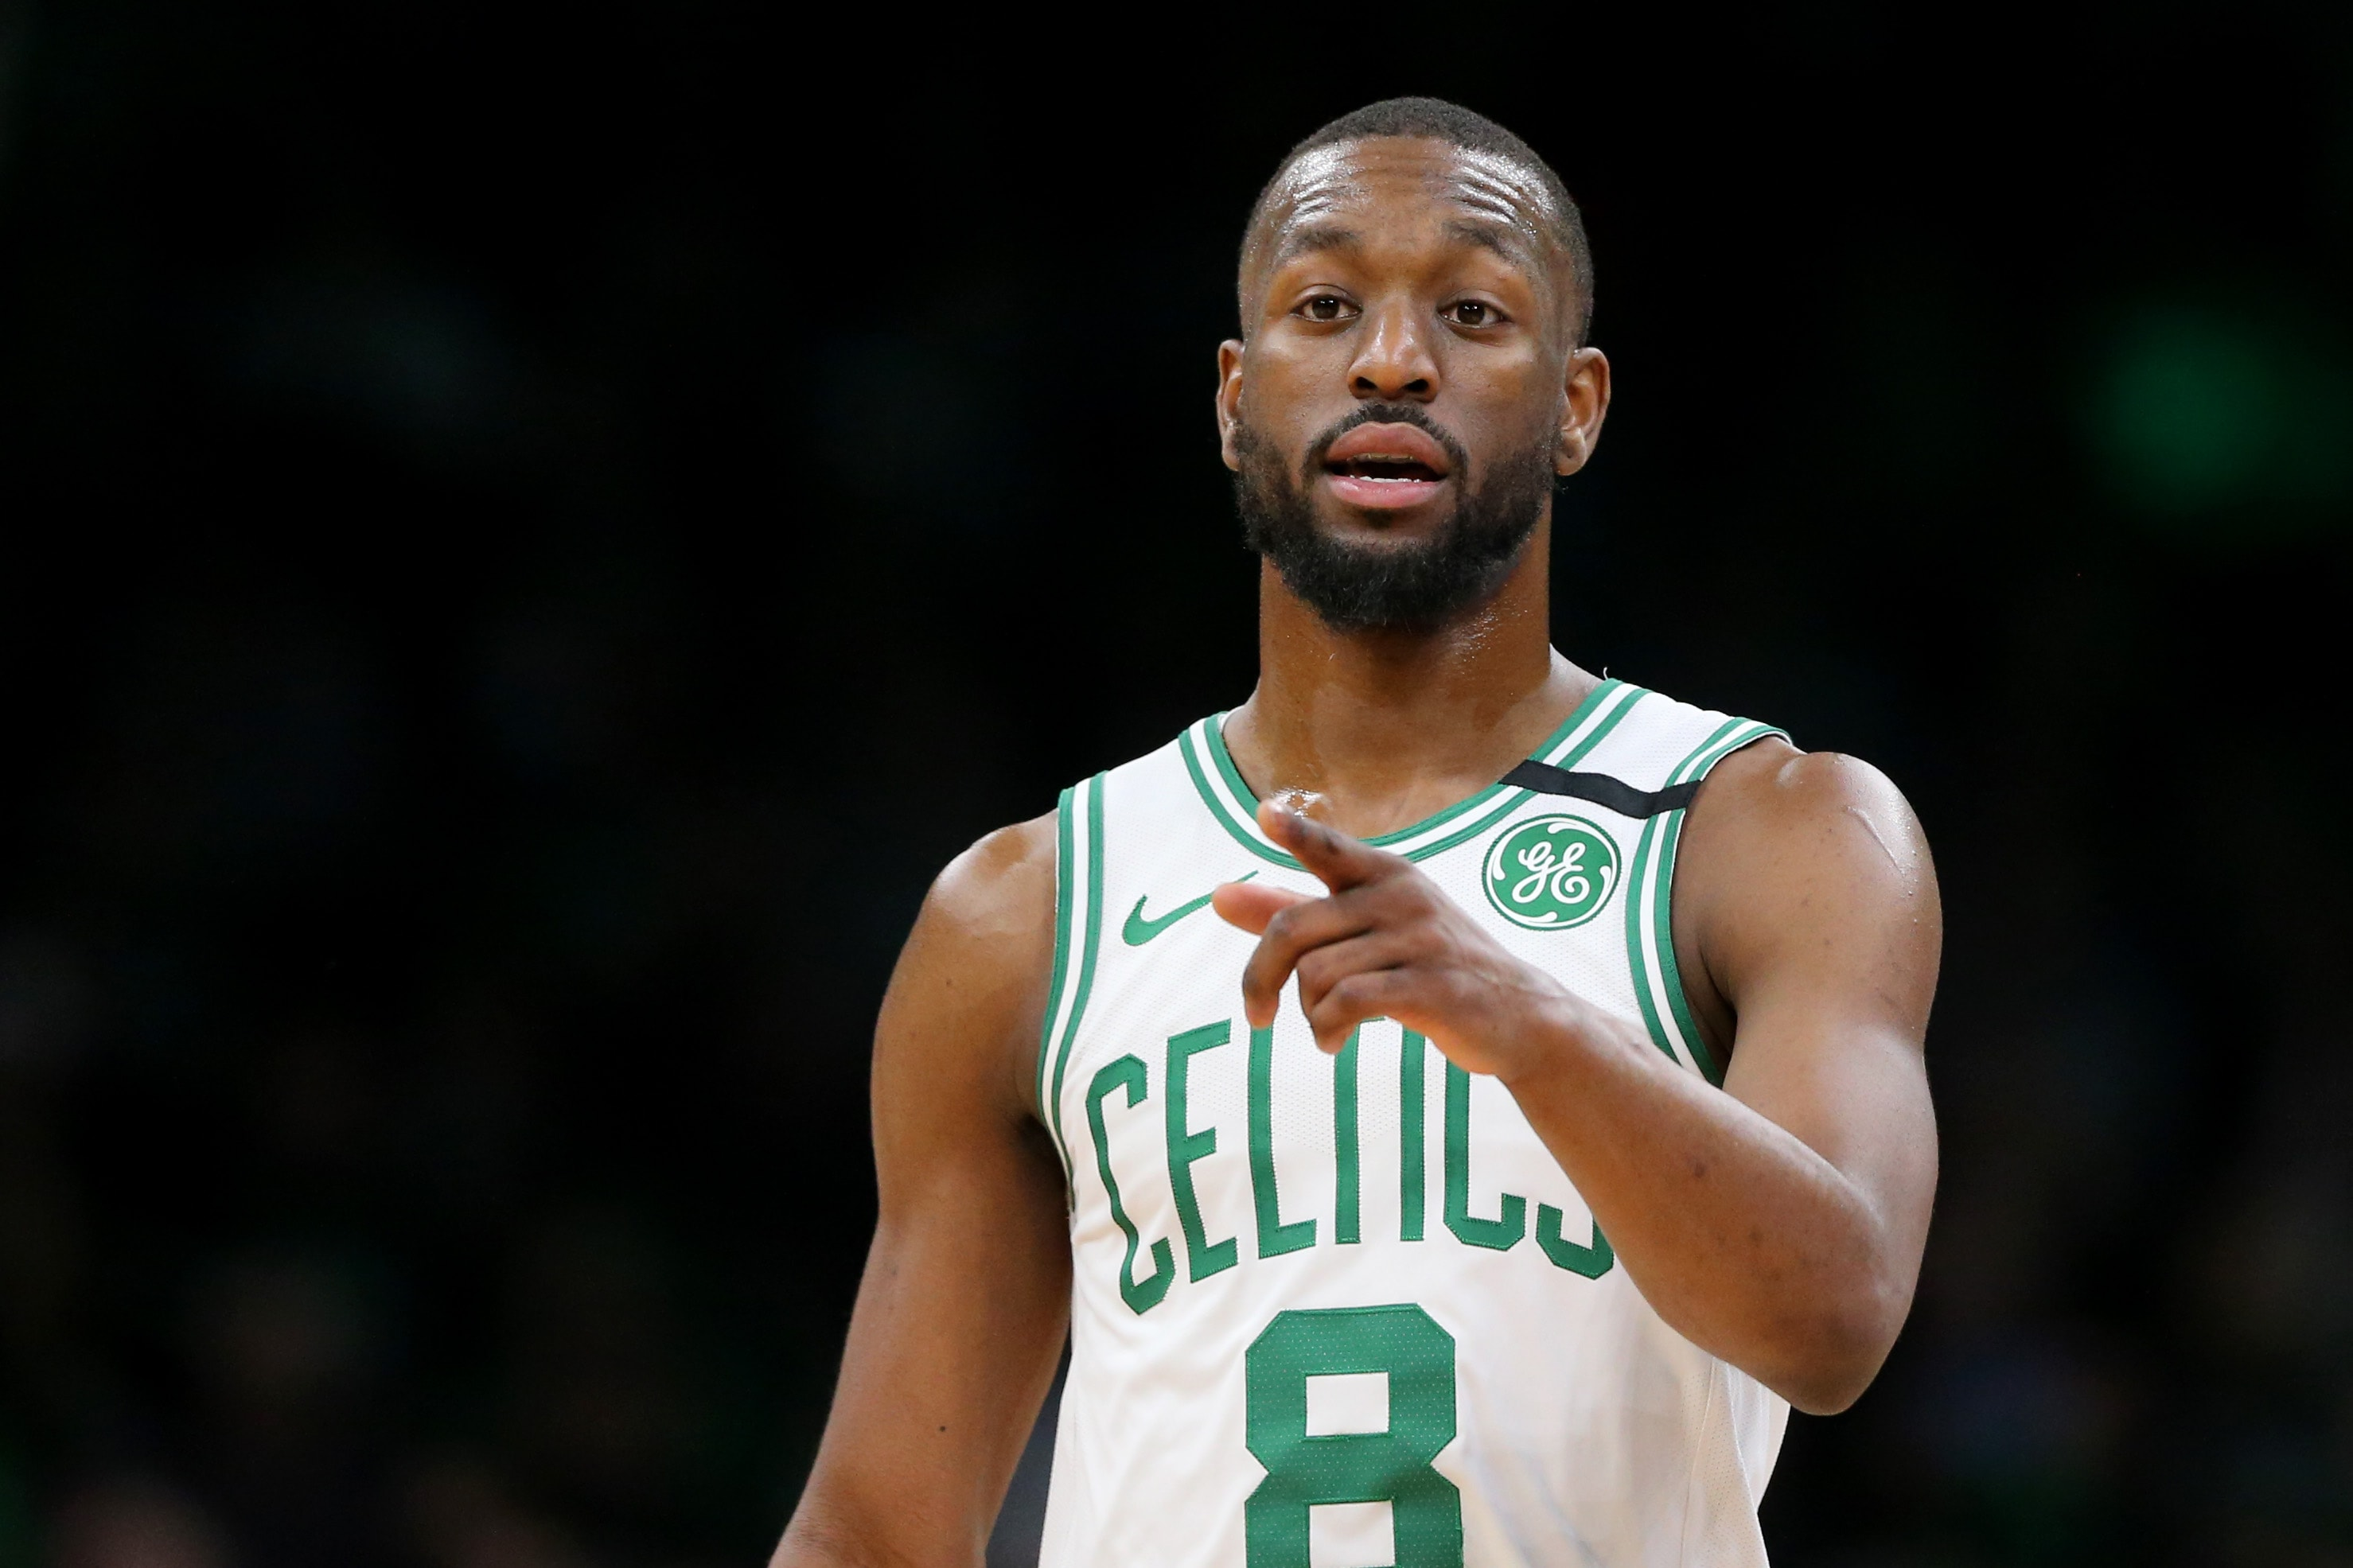 Kemba Walker says Celtics' struggles start with him: 'I just have to be better'